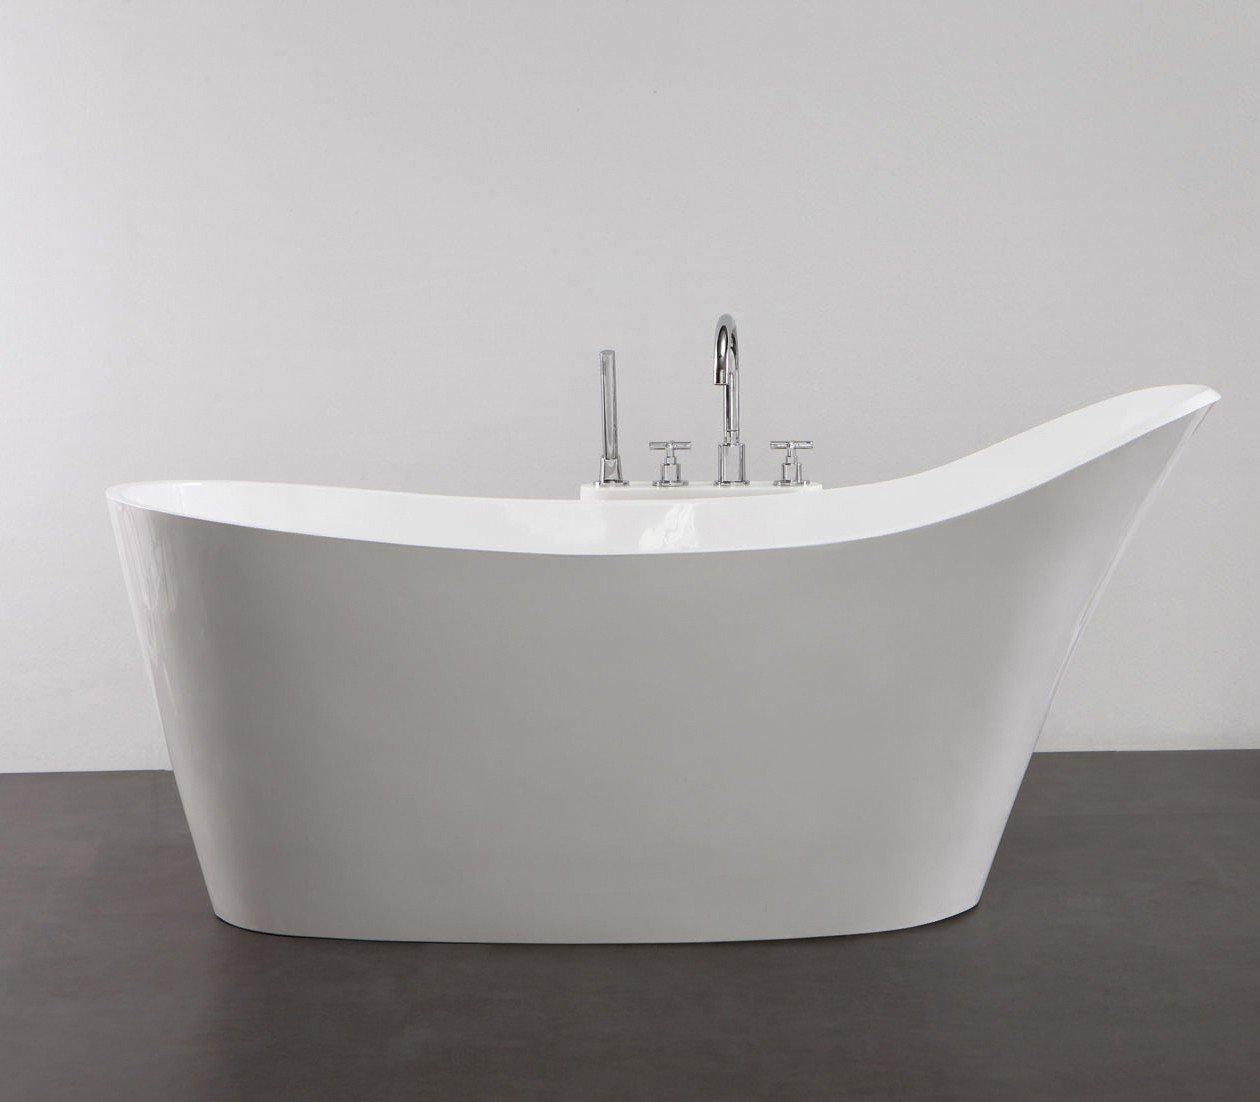 Serina–Vasca da bagno in ghisa minerale, 27010opaco KZOAO